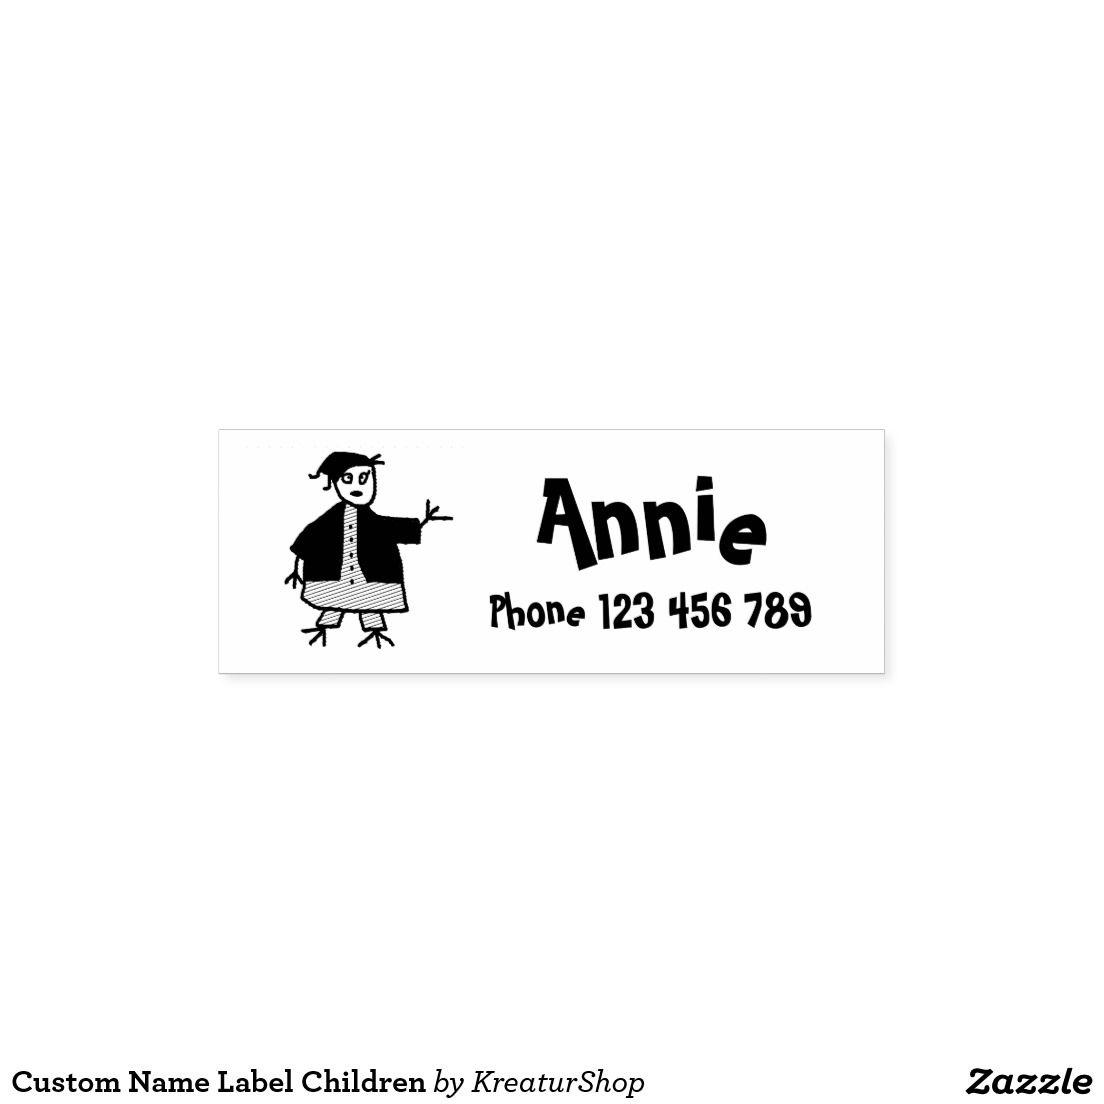 Custom Name Label Children Self-inking Stamp